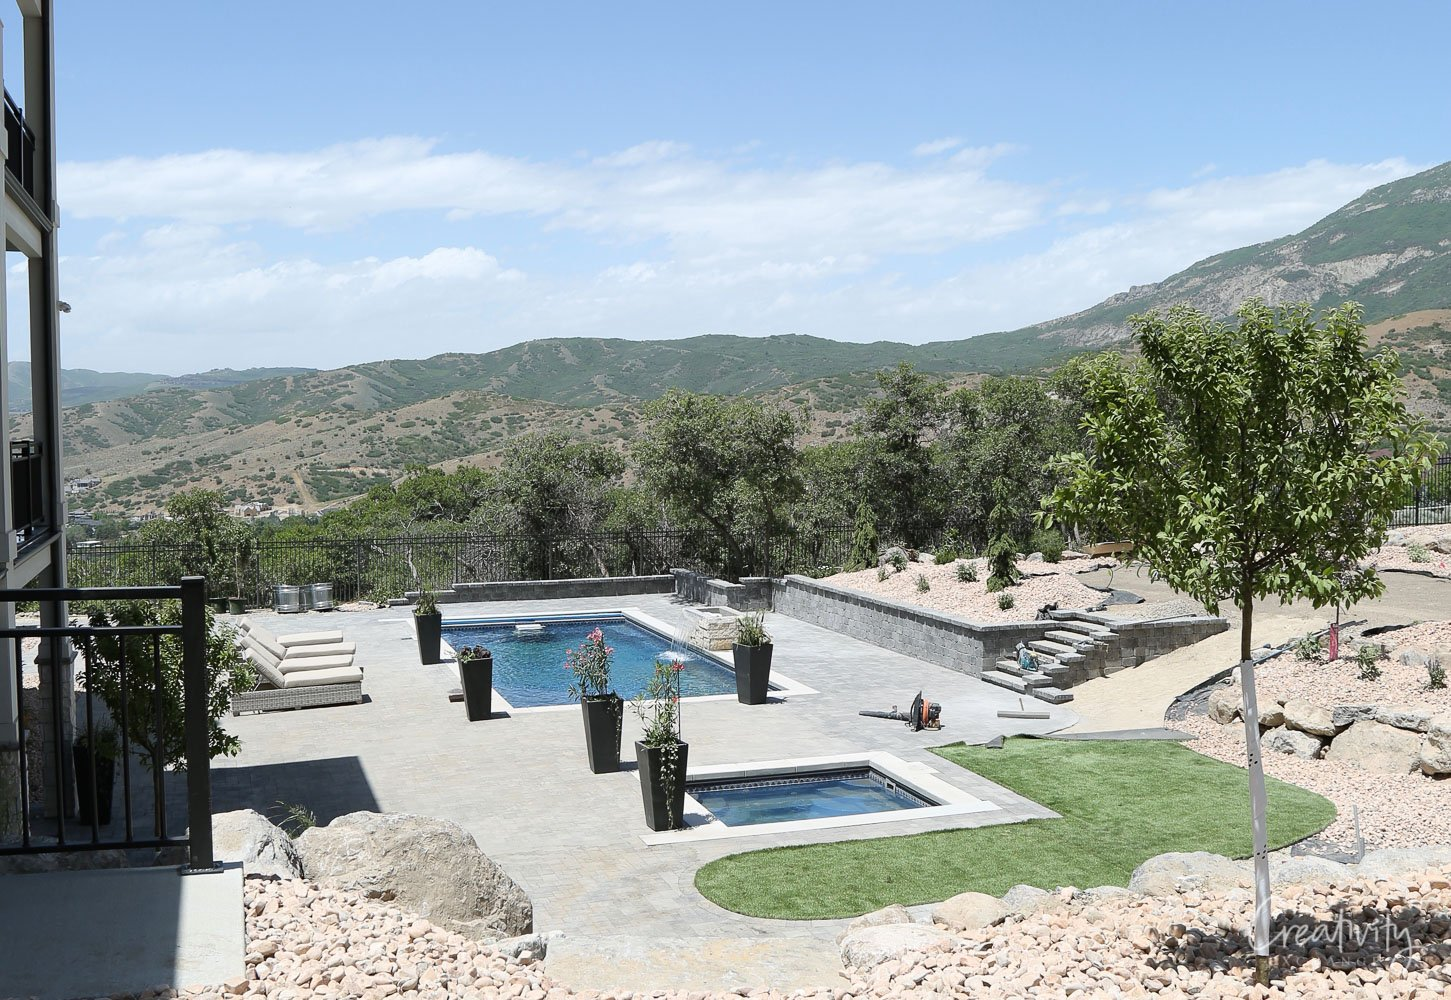 Backyard pool in the mountains